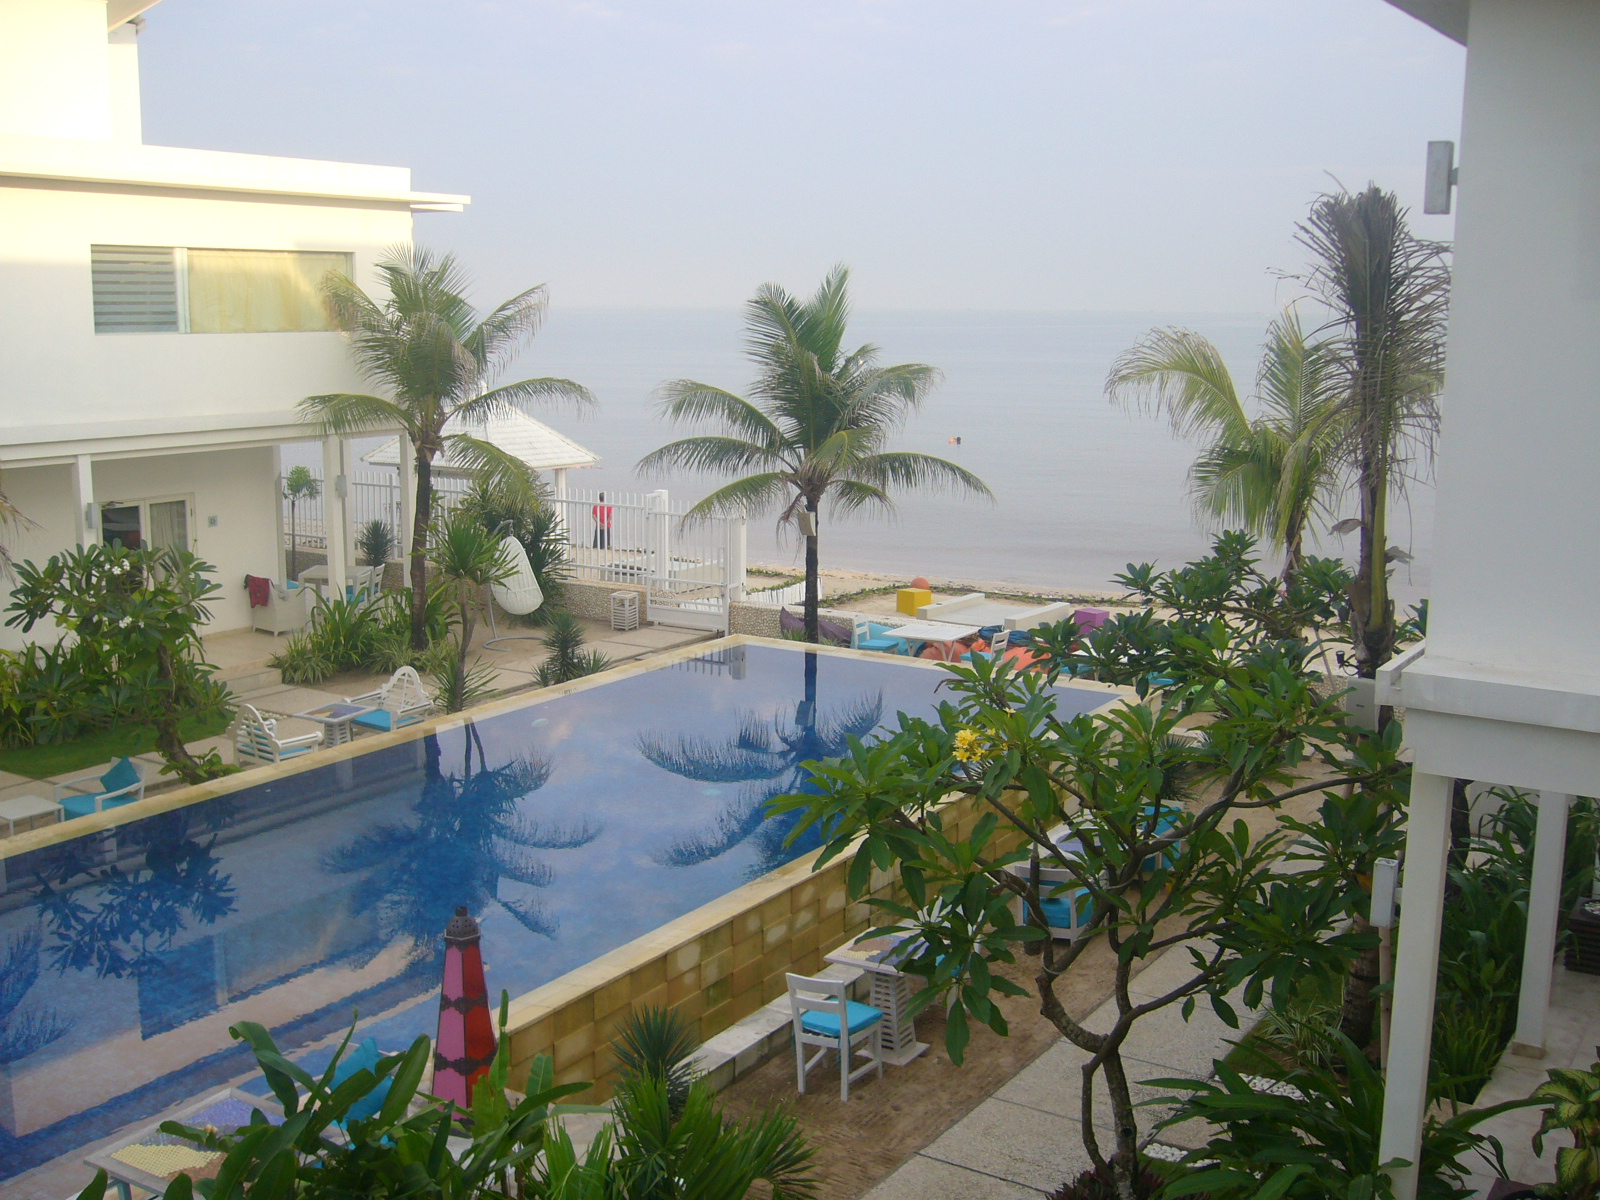 Adank Bendo S Life Journey Foto Hot Di Jepara Ocean View Hotel